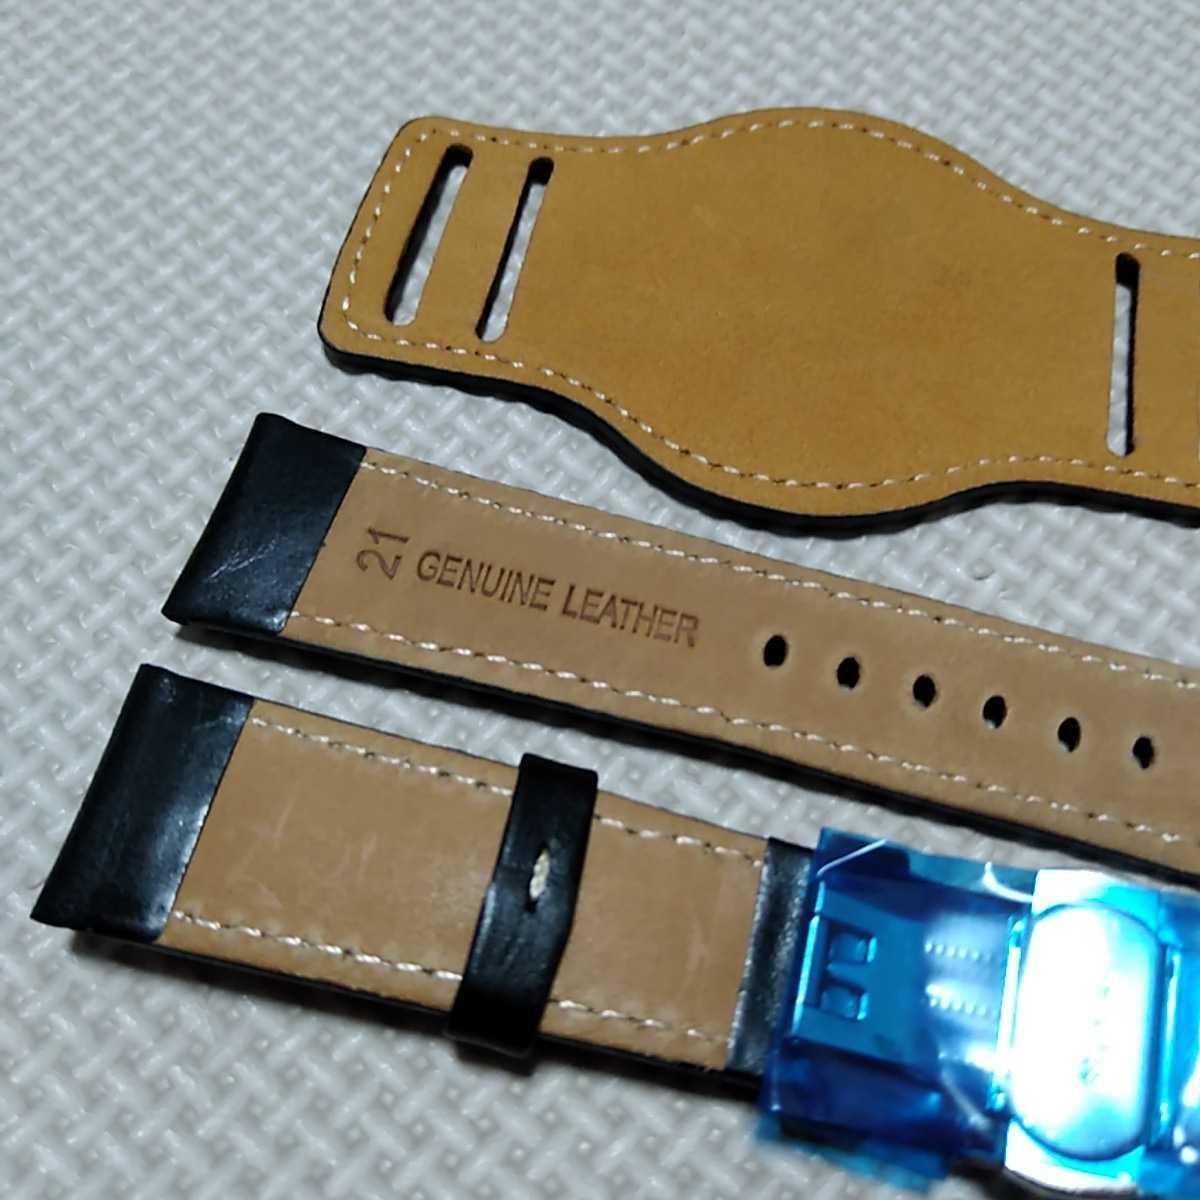 No71 ブンド BUND 本革レザーベルト 腕時計ベルト 交換用ストラップ ブラック 21mm 未使用 Dバックル 高品質 ドイツパイロット 空軍_画像4